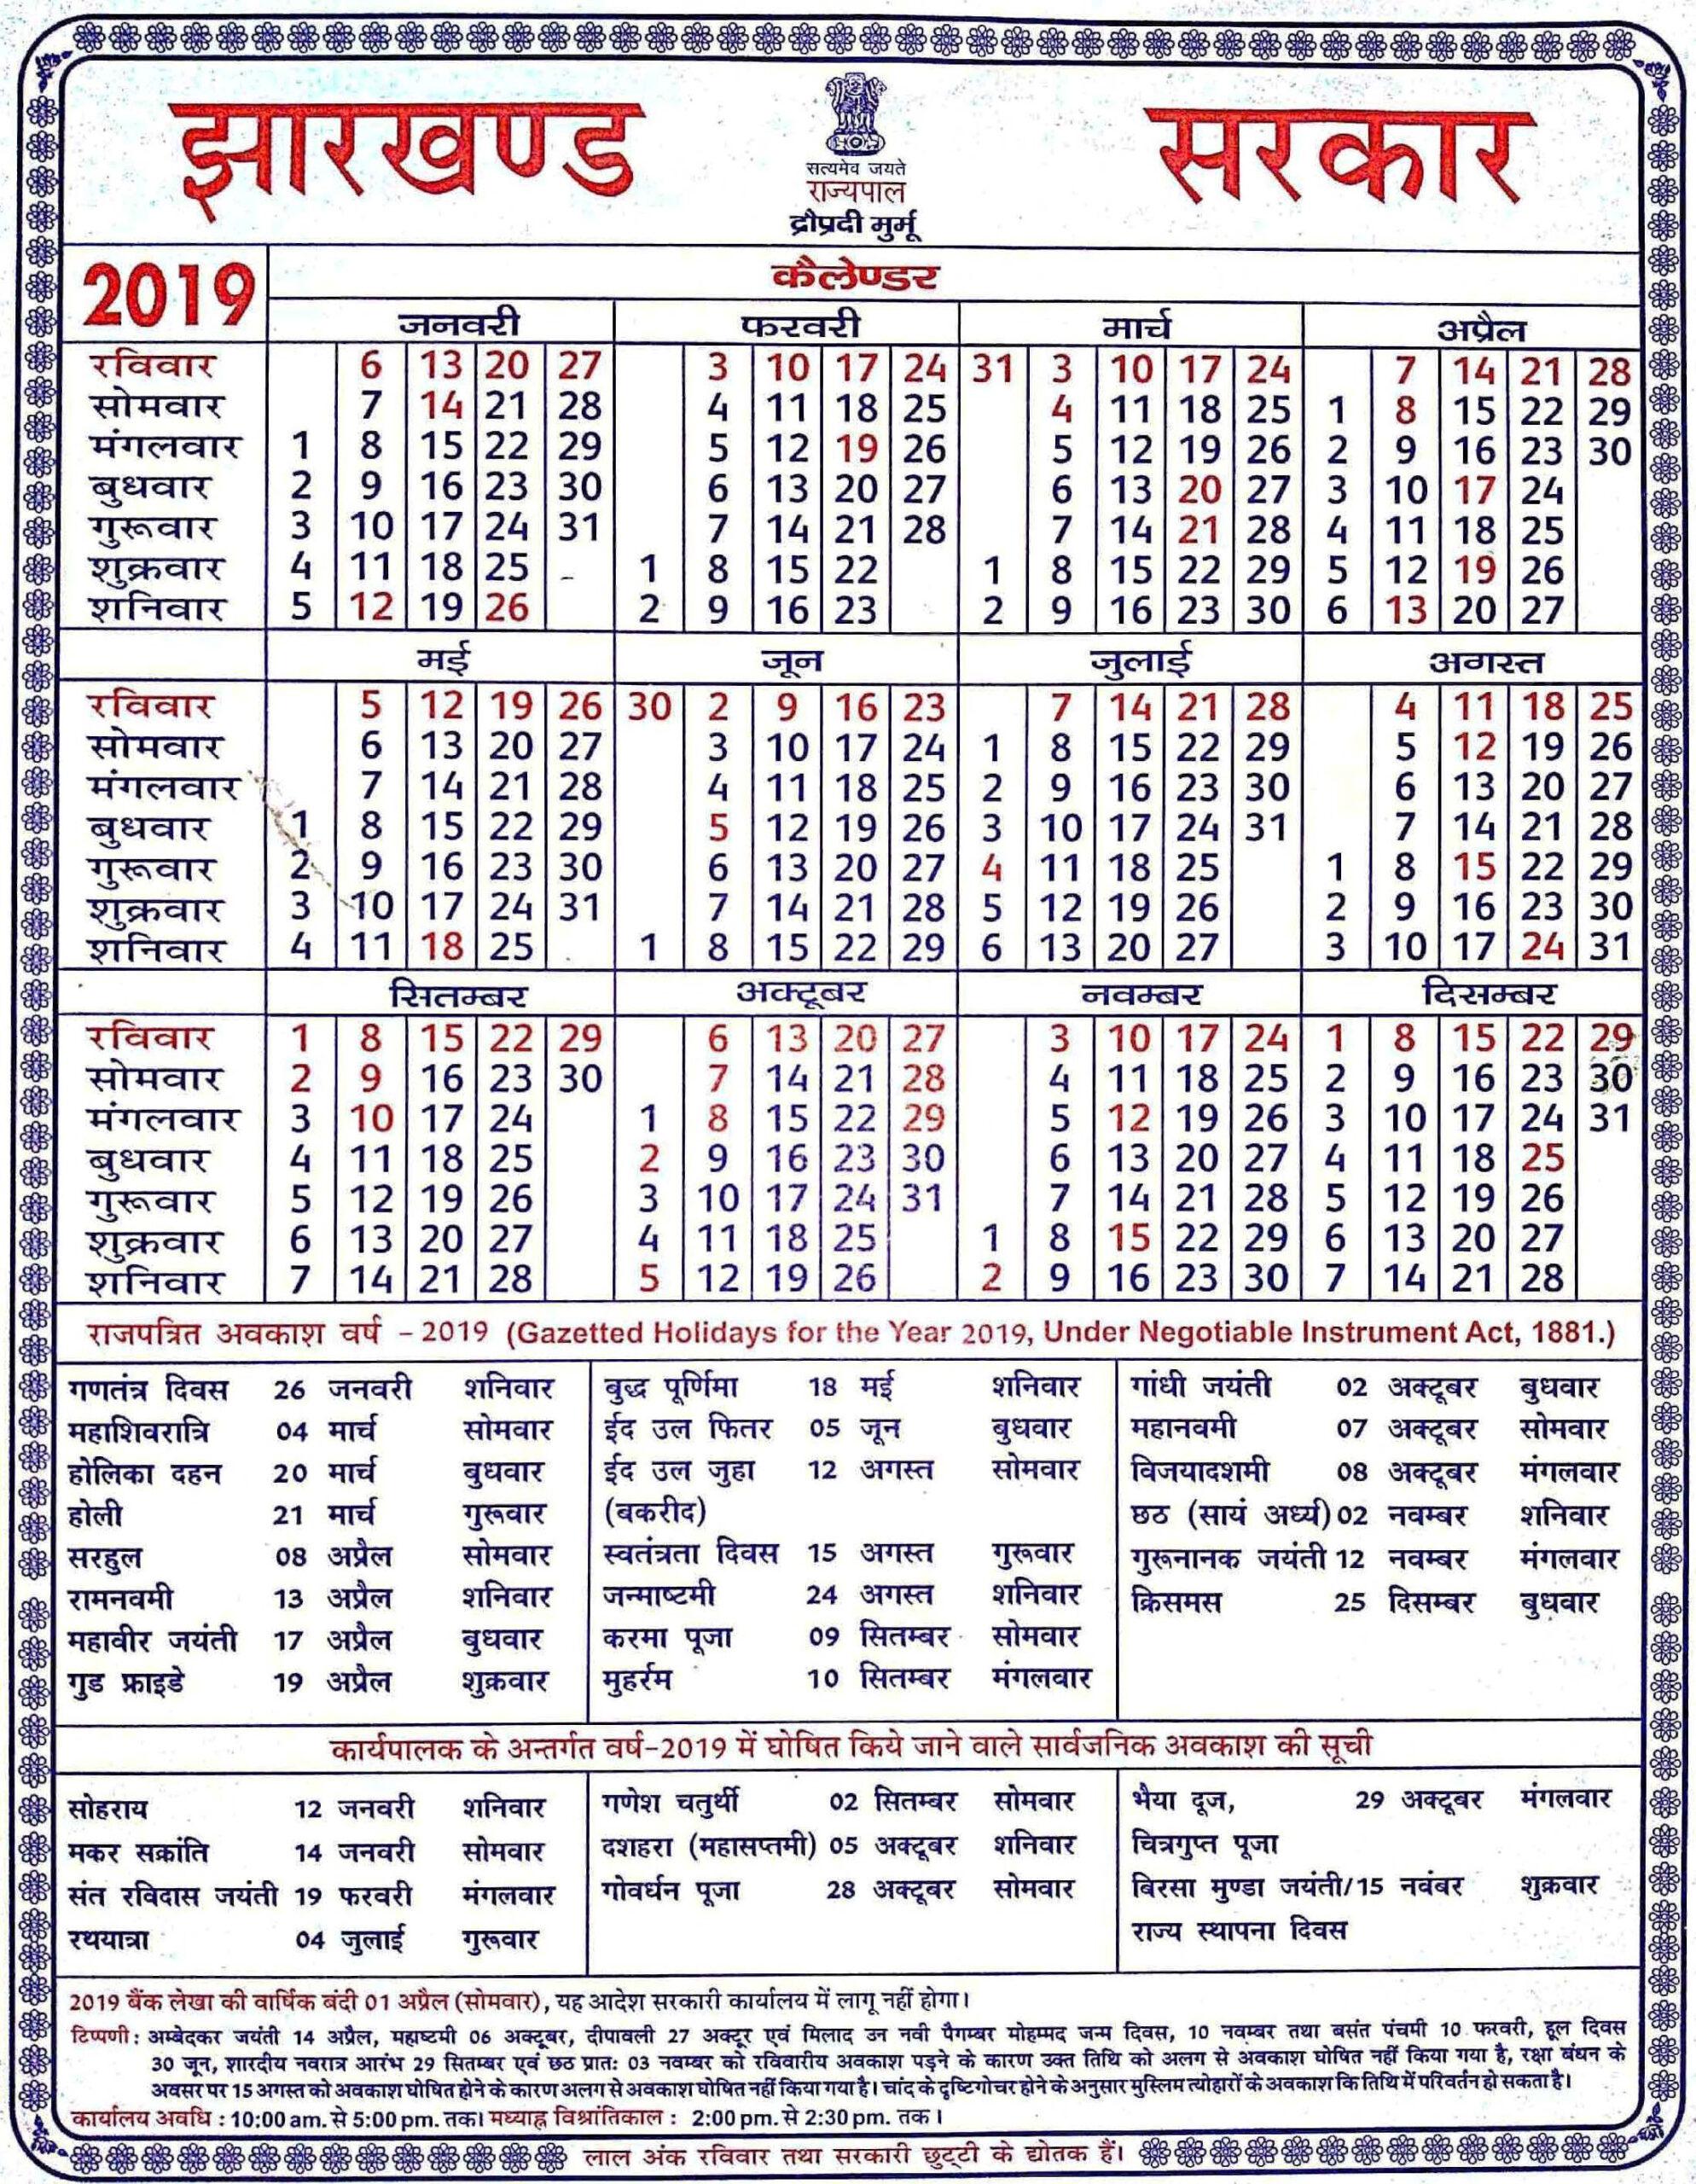 Bihar Sarkar Calender 2020 | Calendar For Planning intended for Calendar 2018 Bihar Sarkar